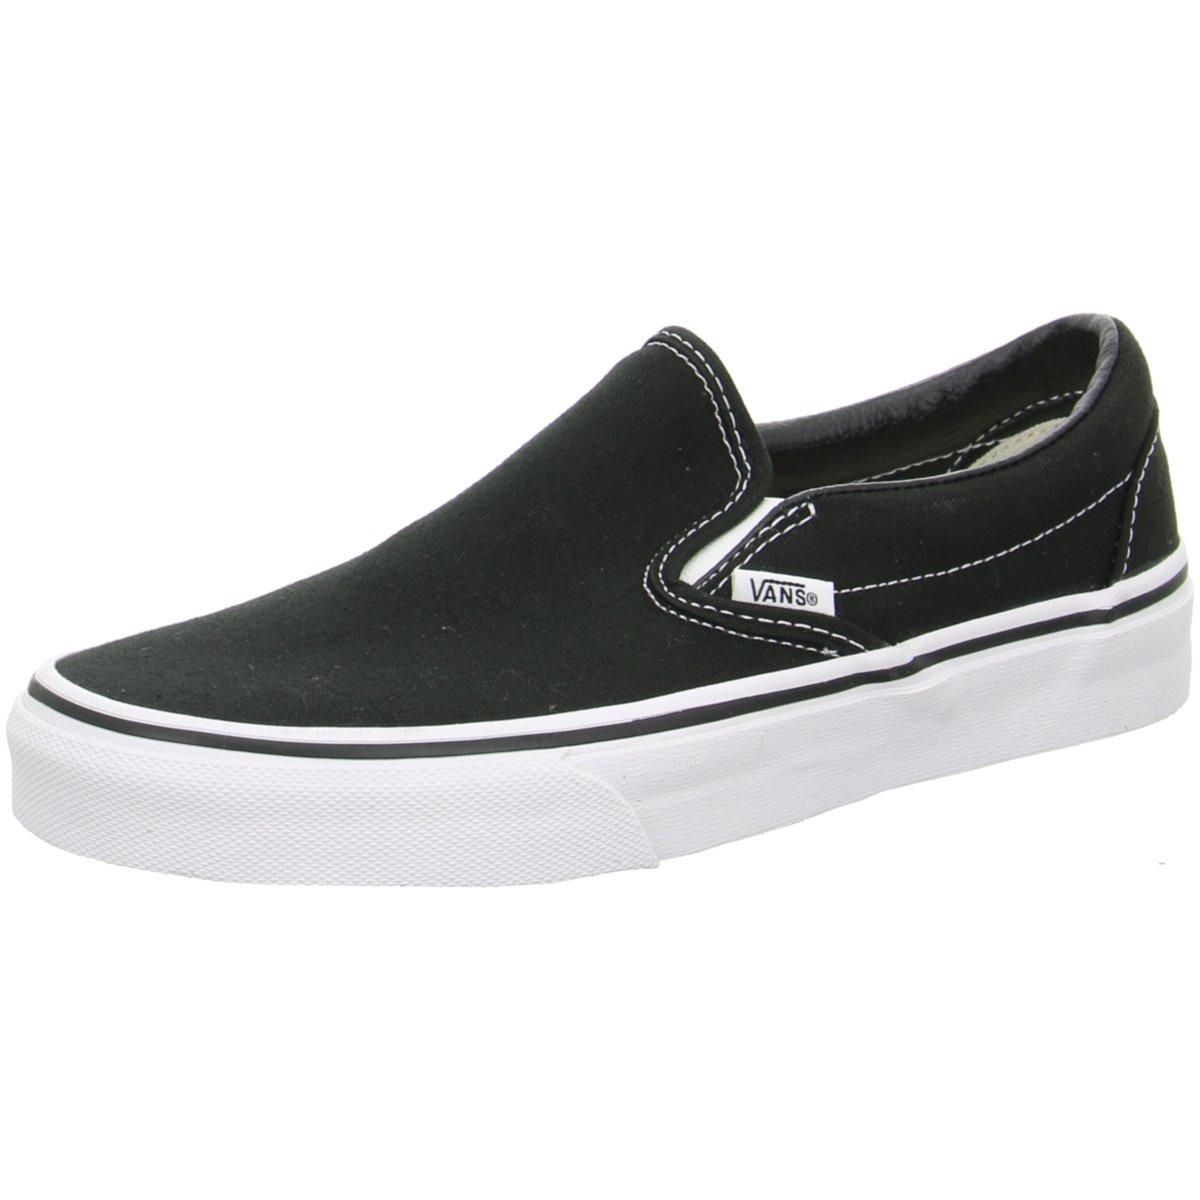 NEU Vans Herren Slipper Classic Slip-On Sneaker VEYEBLK schwarz 106918